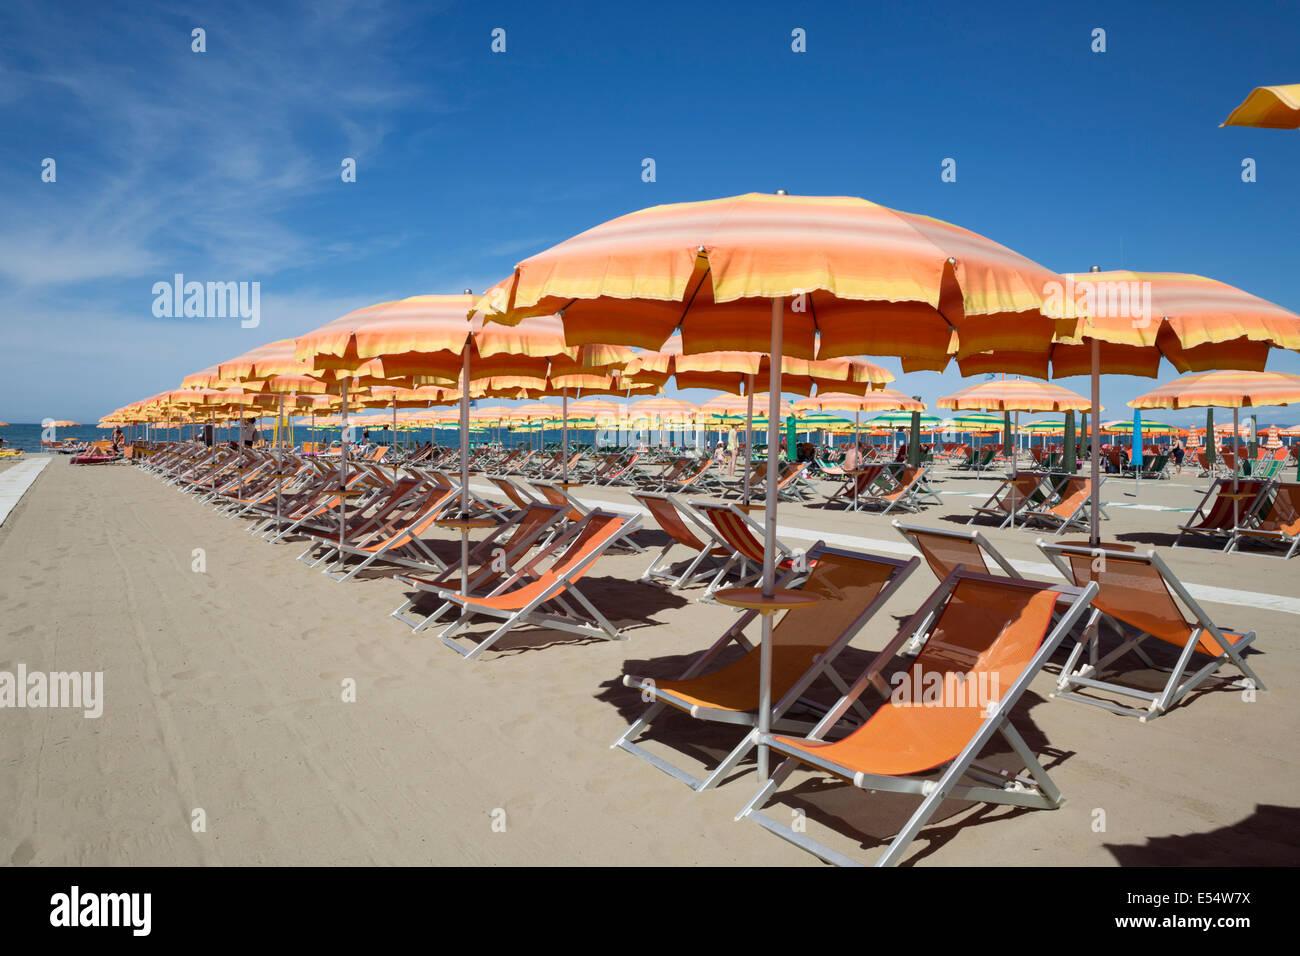 Strand Sonnenschirme und Liegestühle, Viareggio, Toskana, Italien, Europa Stockbild